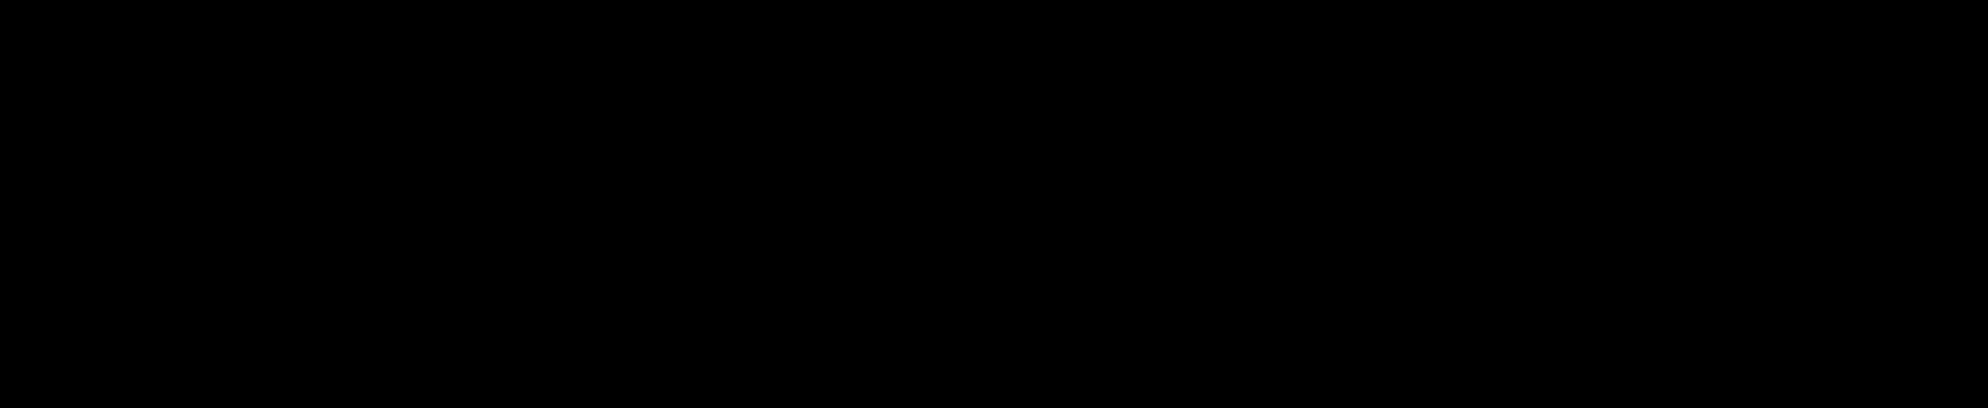 matteo mescalchin